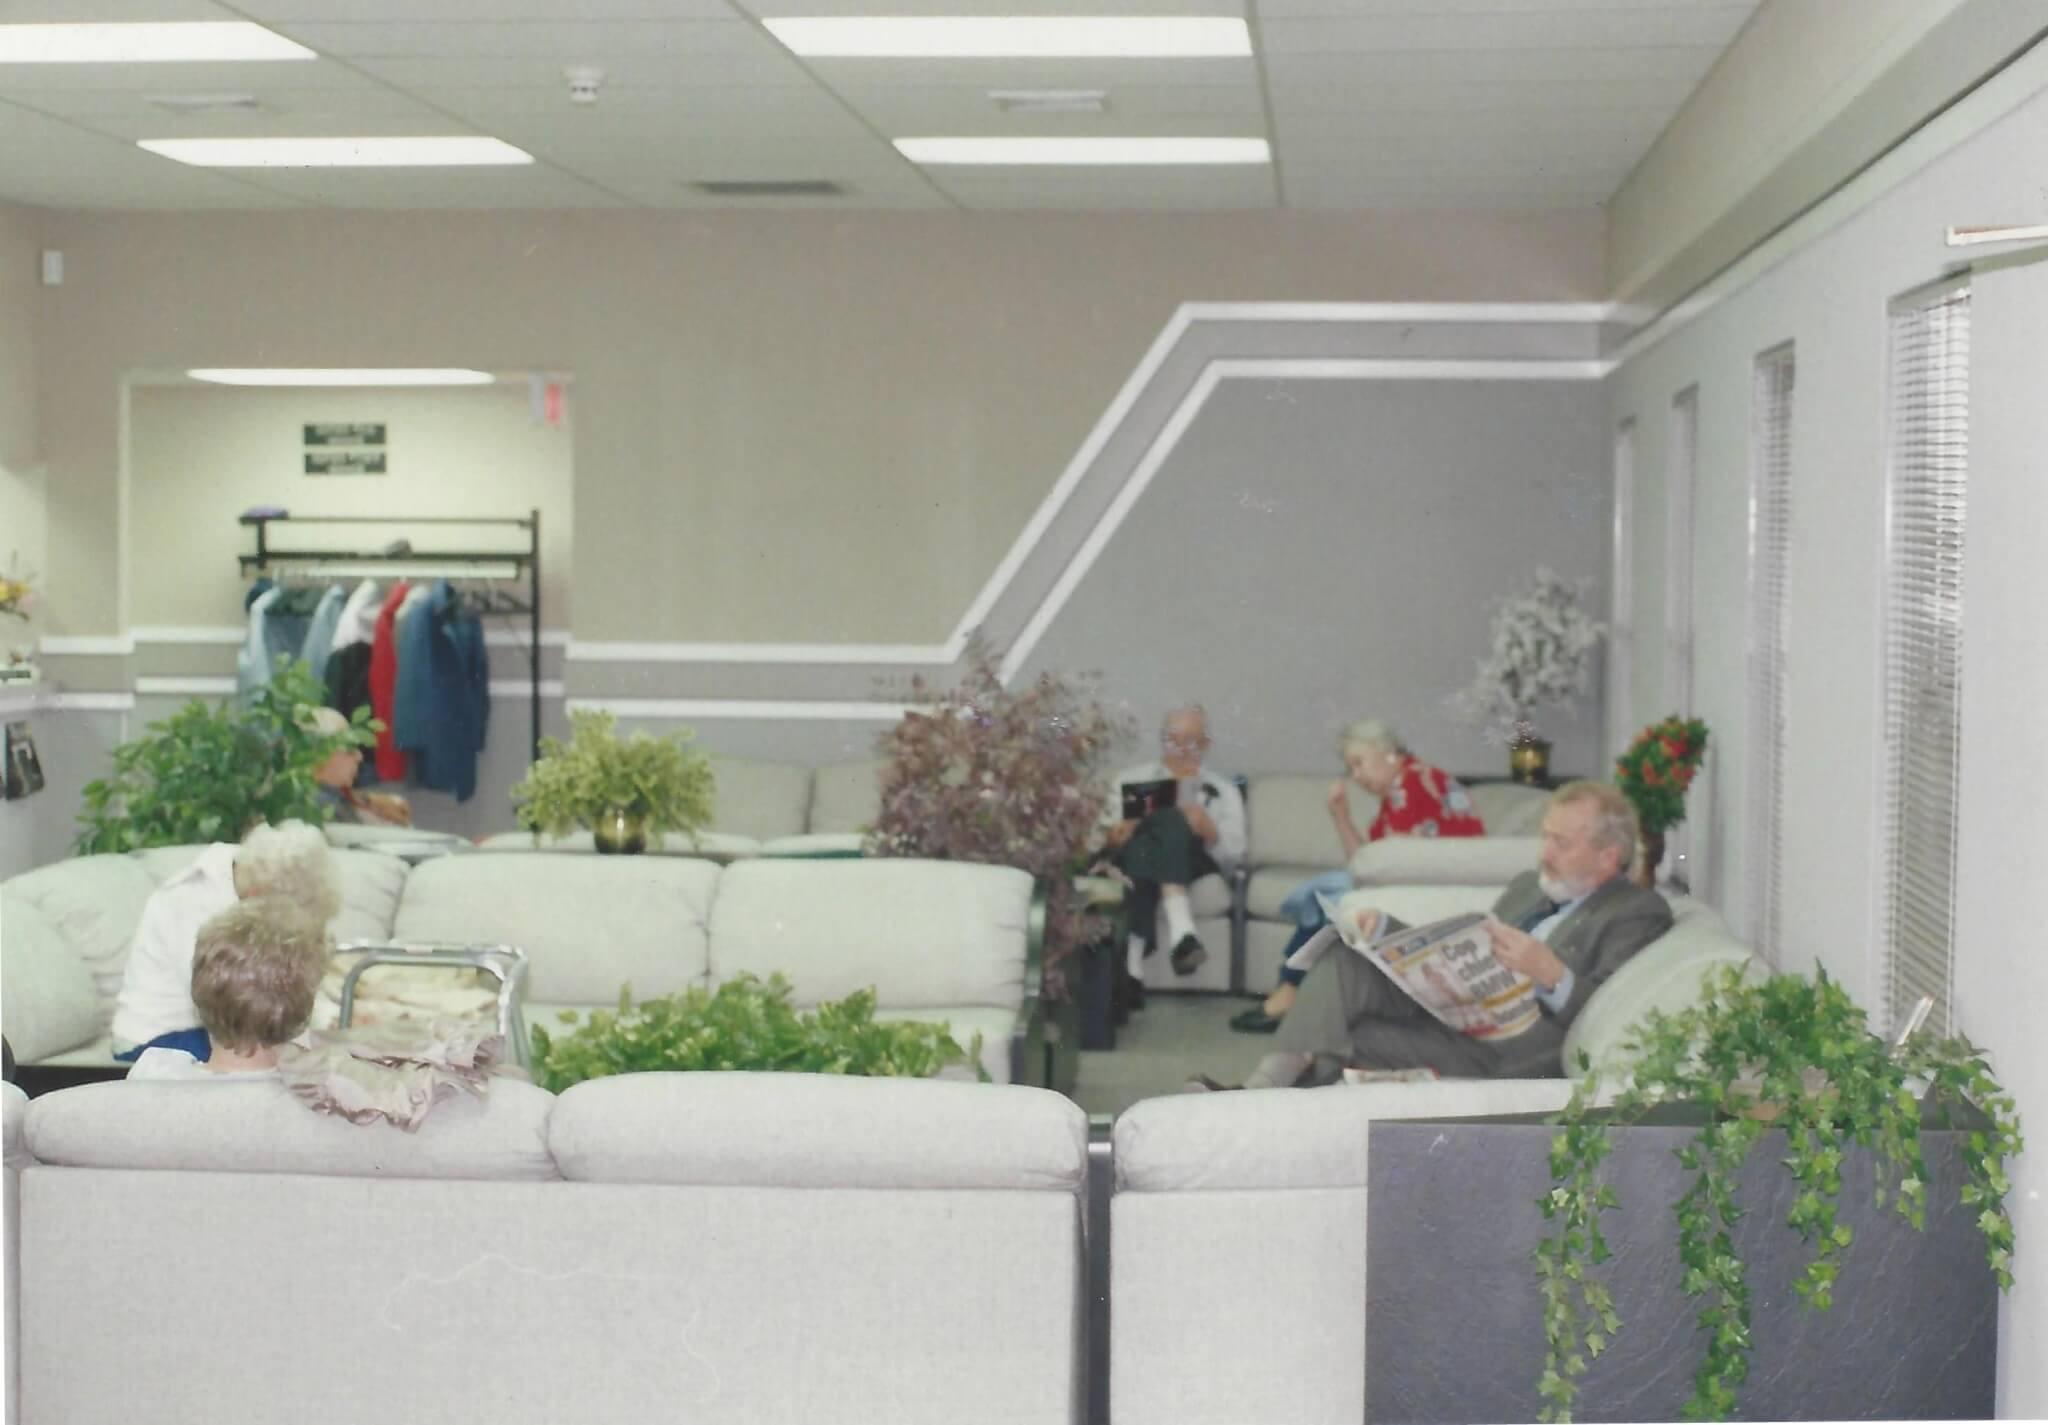 Medical Tenant-Fitout interior & design llc